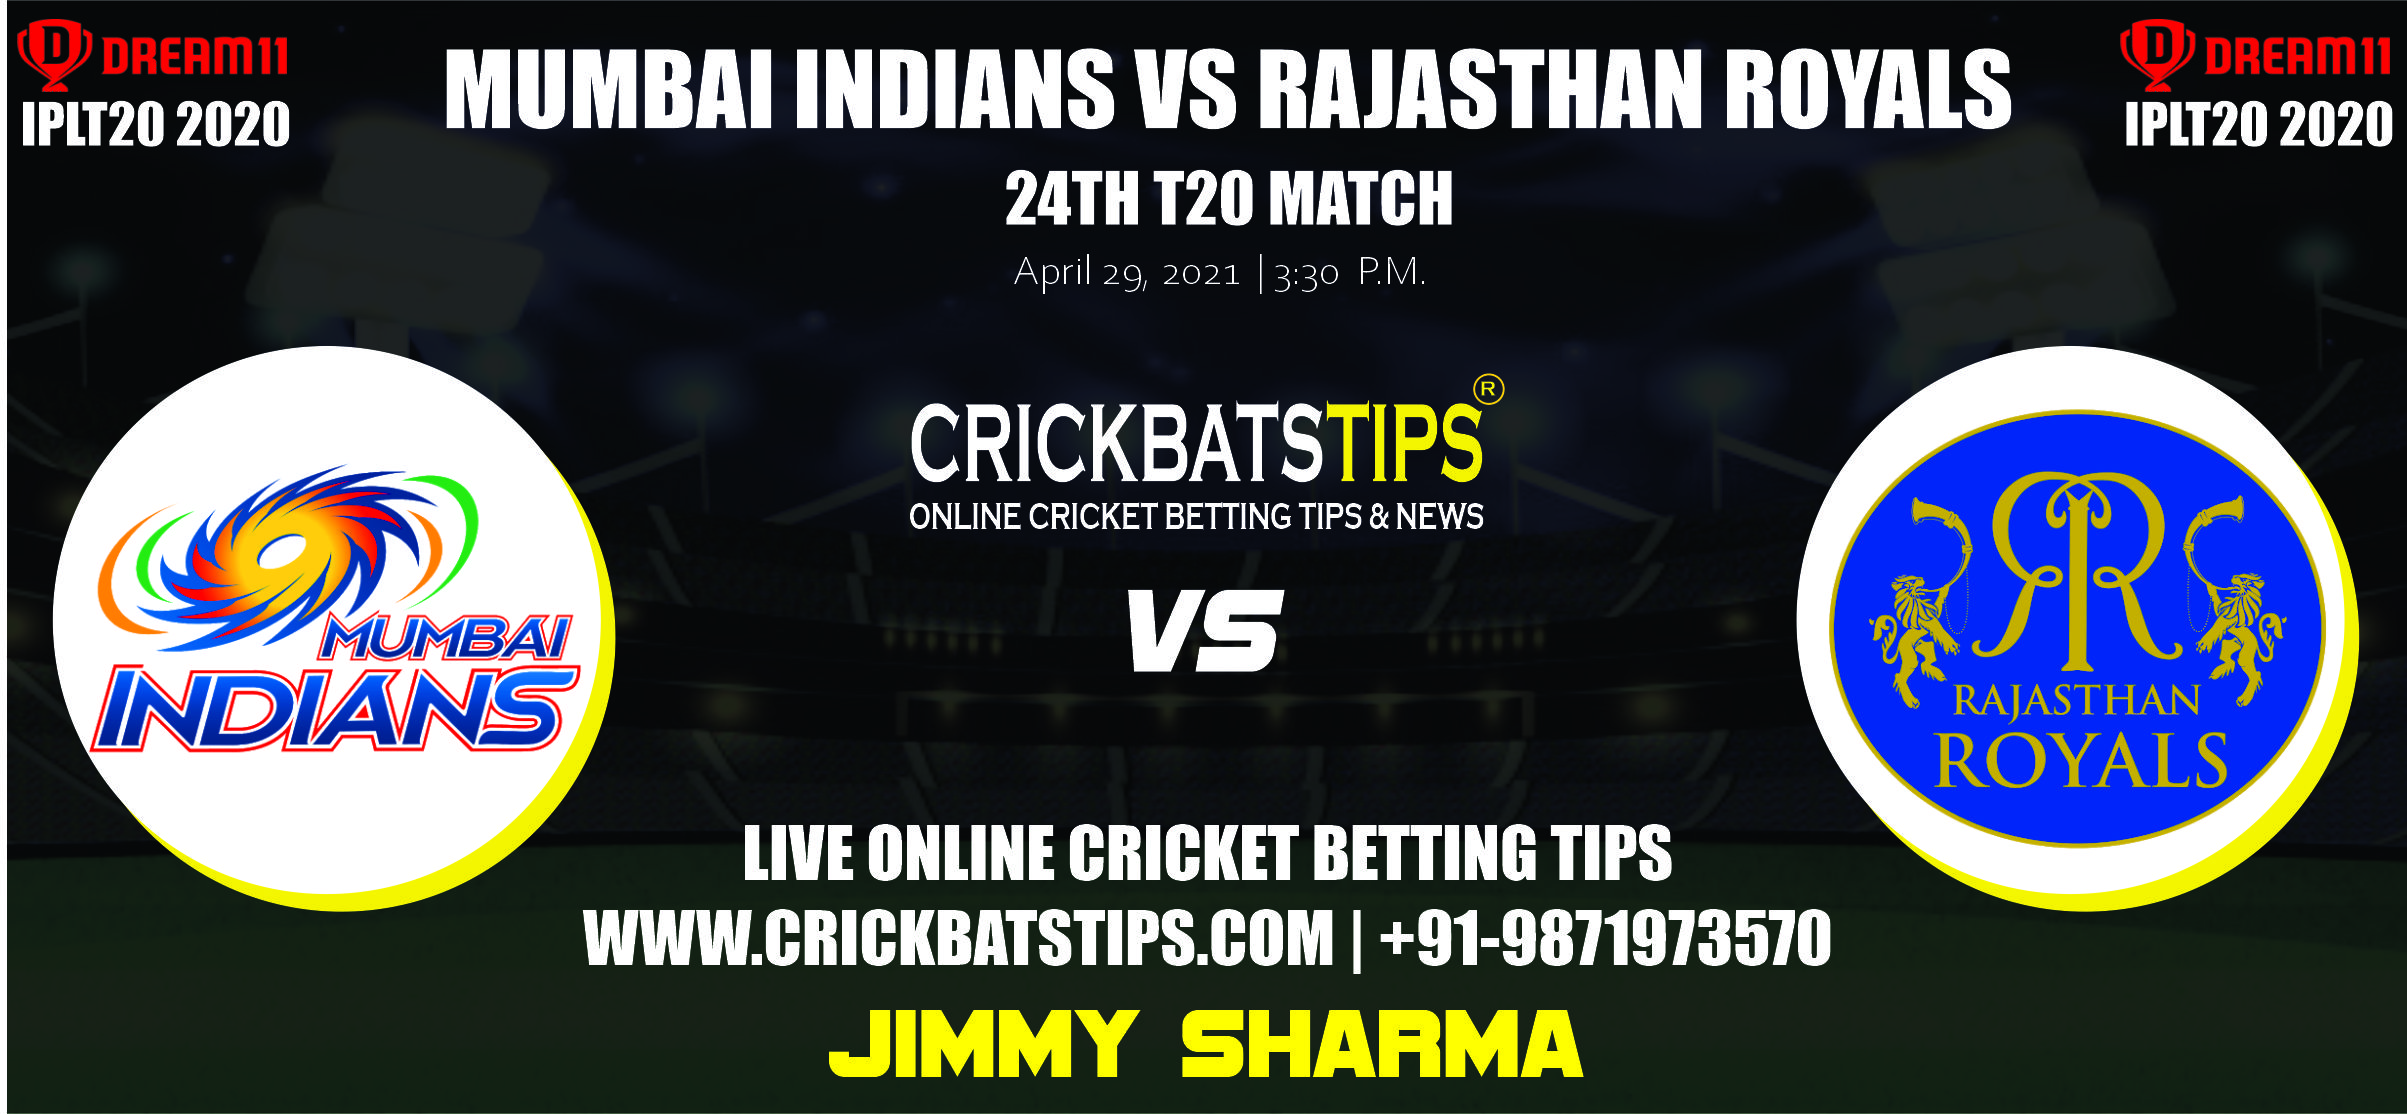 Mumbai-Indians-vs-Rajasthan-Royals-MIvRR-MIvsRR-RRvMI-RRvsMI-Rajasthan-Royals-vs-Mumbai-Indians-IPL-2021